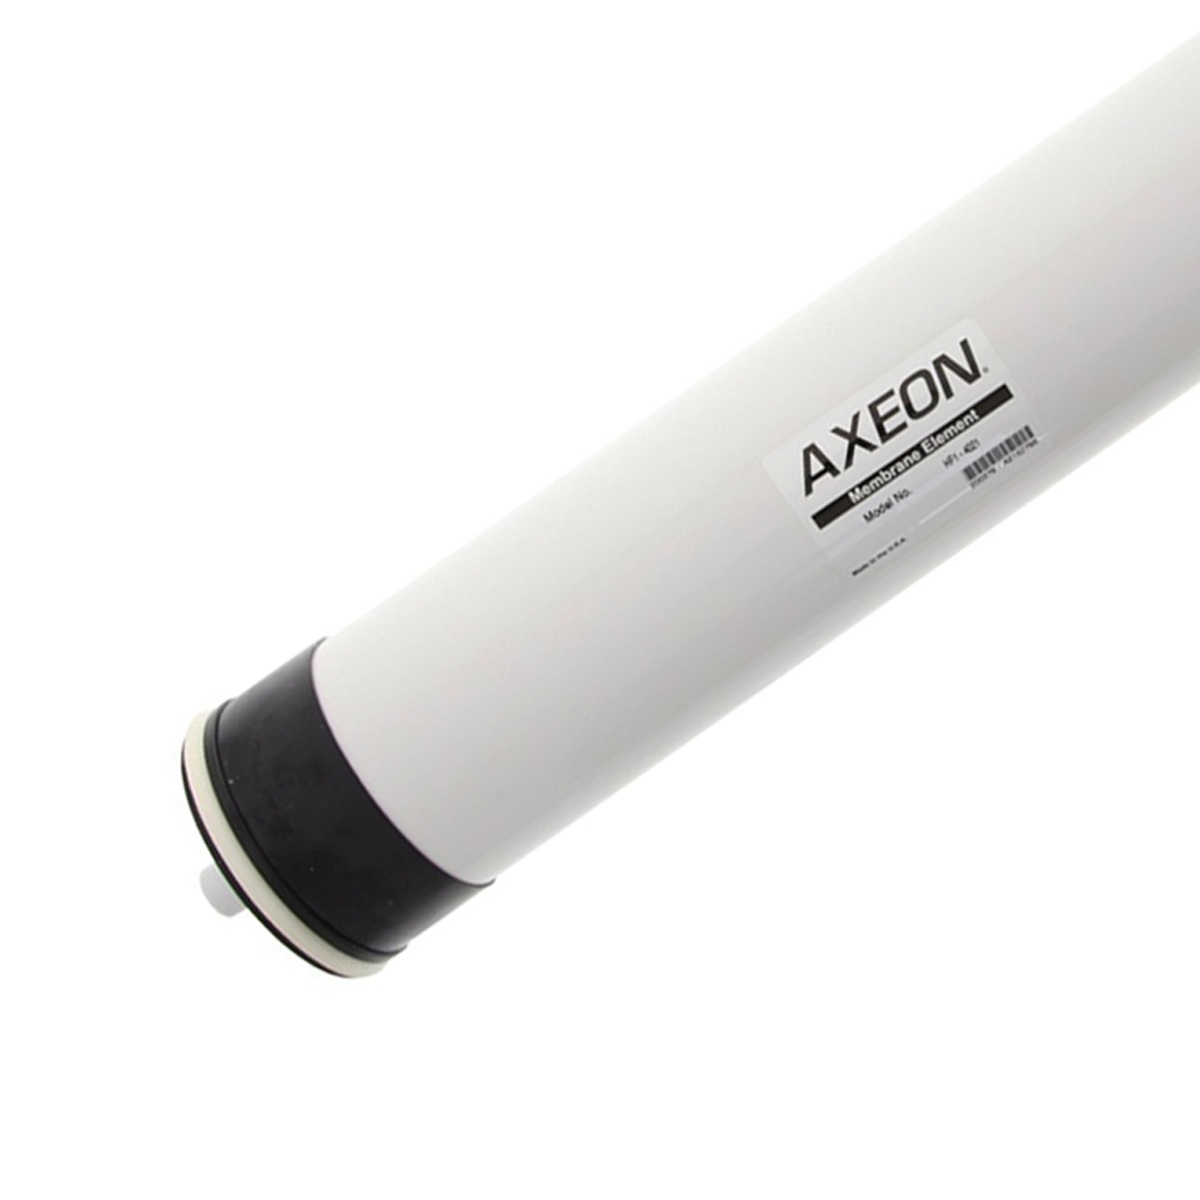 Axeon Nf4 Nanofiltration Membrane Element 4040 Dry